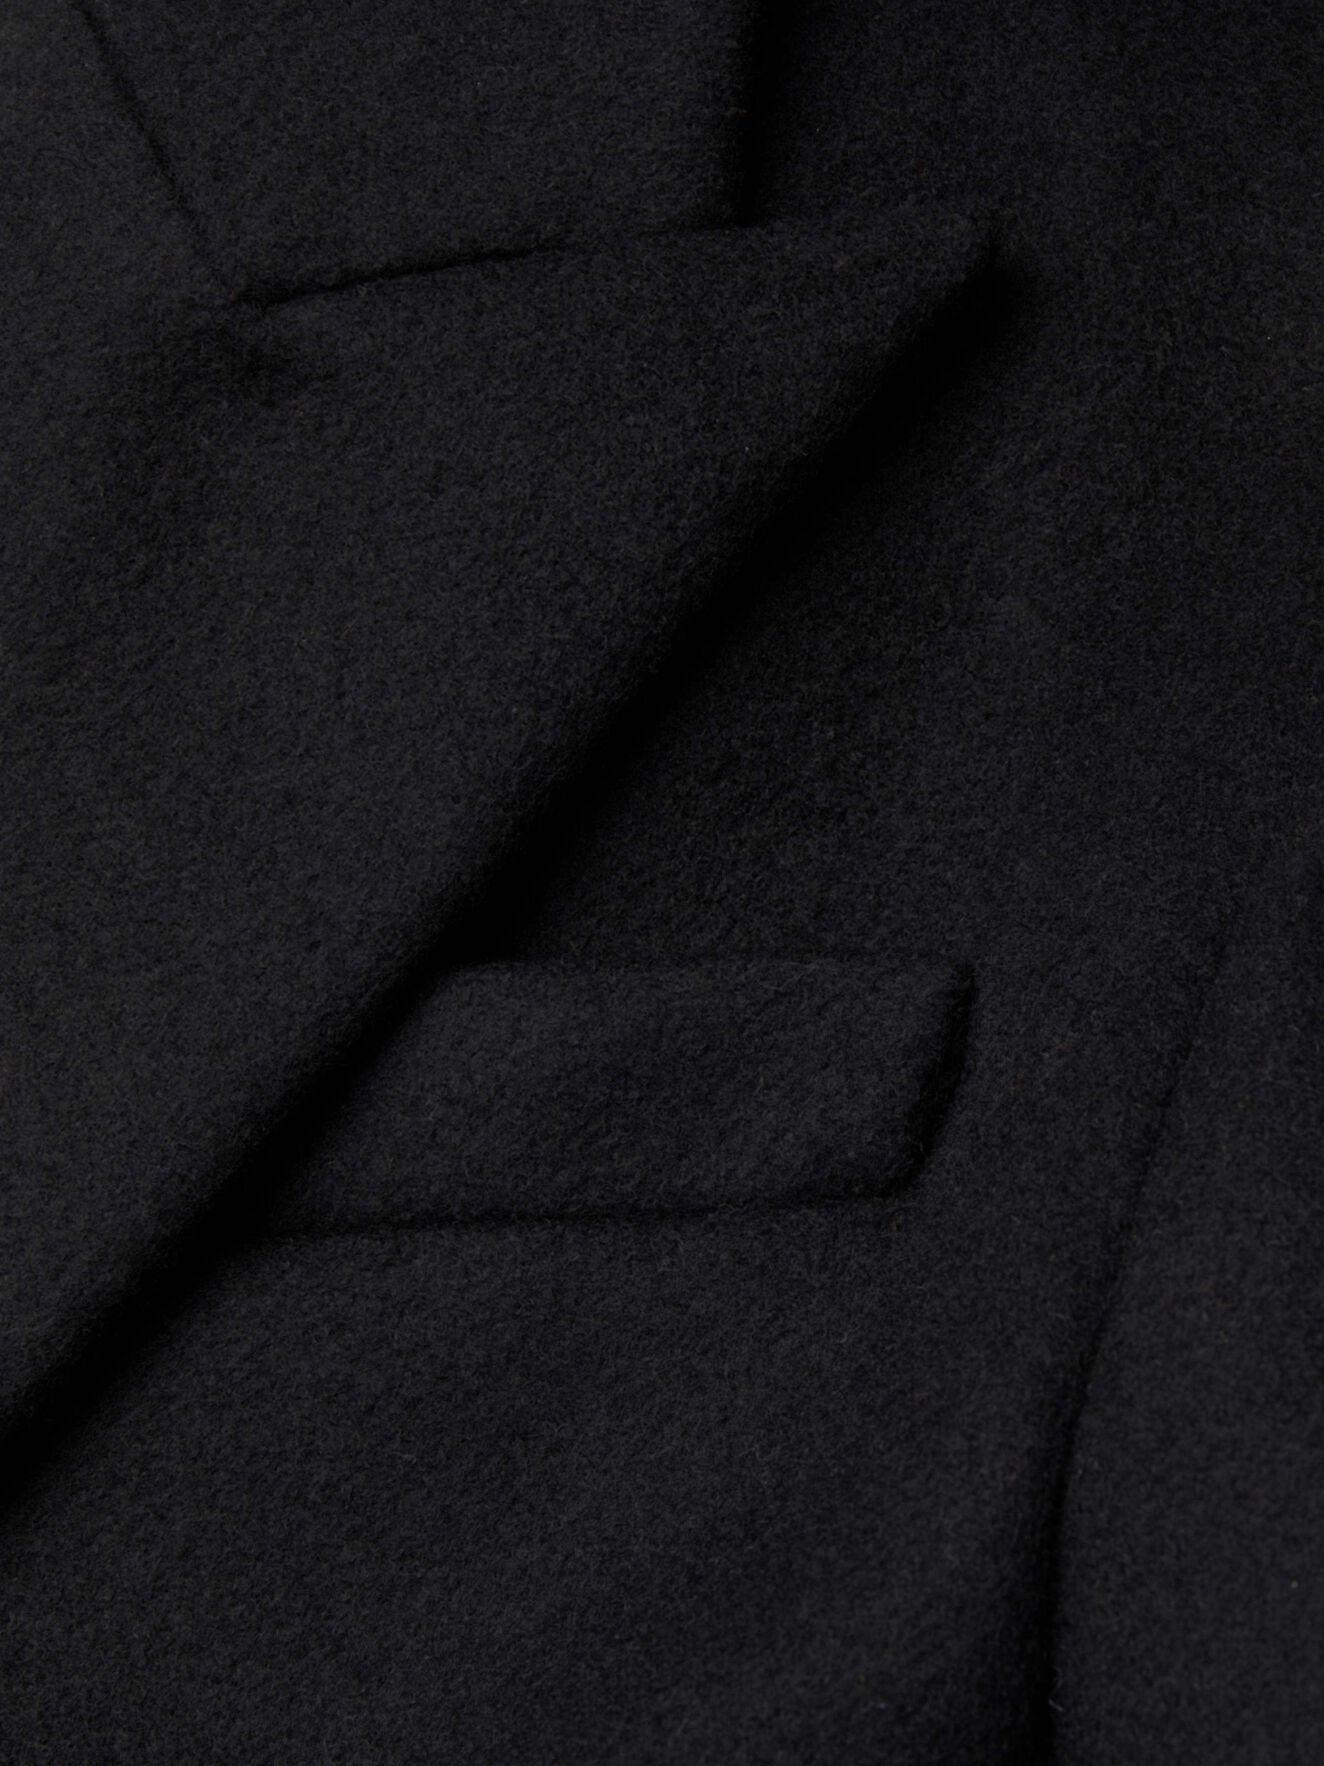 Acis Blazer in Midnight Black from Tiger of Sweden